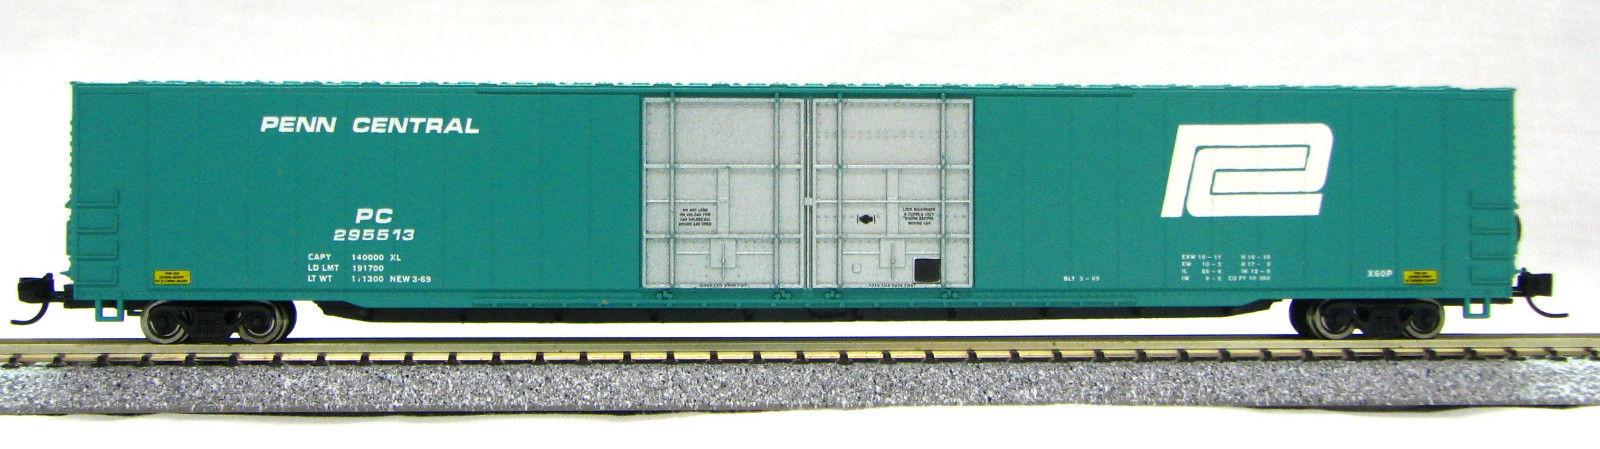 N Scale - Con-Cor - 0001-14662 - Boxcar, 85 or 86 Foot, Auto Parts - Penn Central - 295513